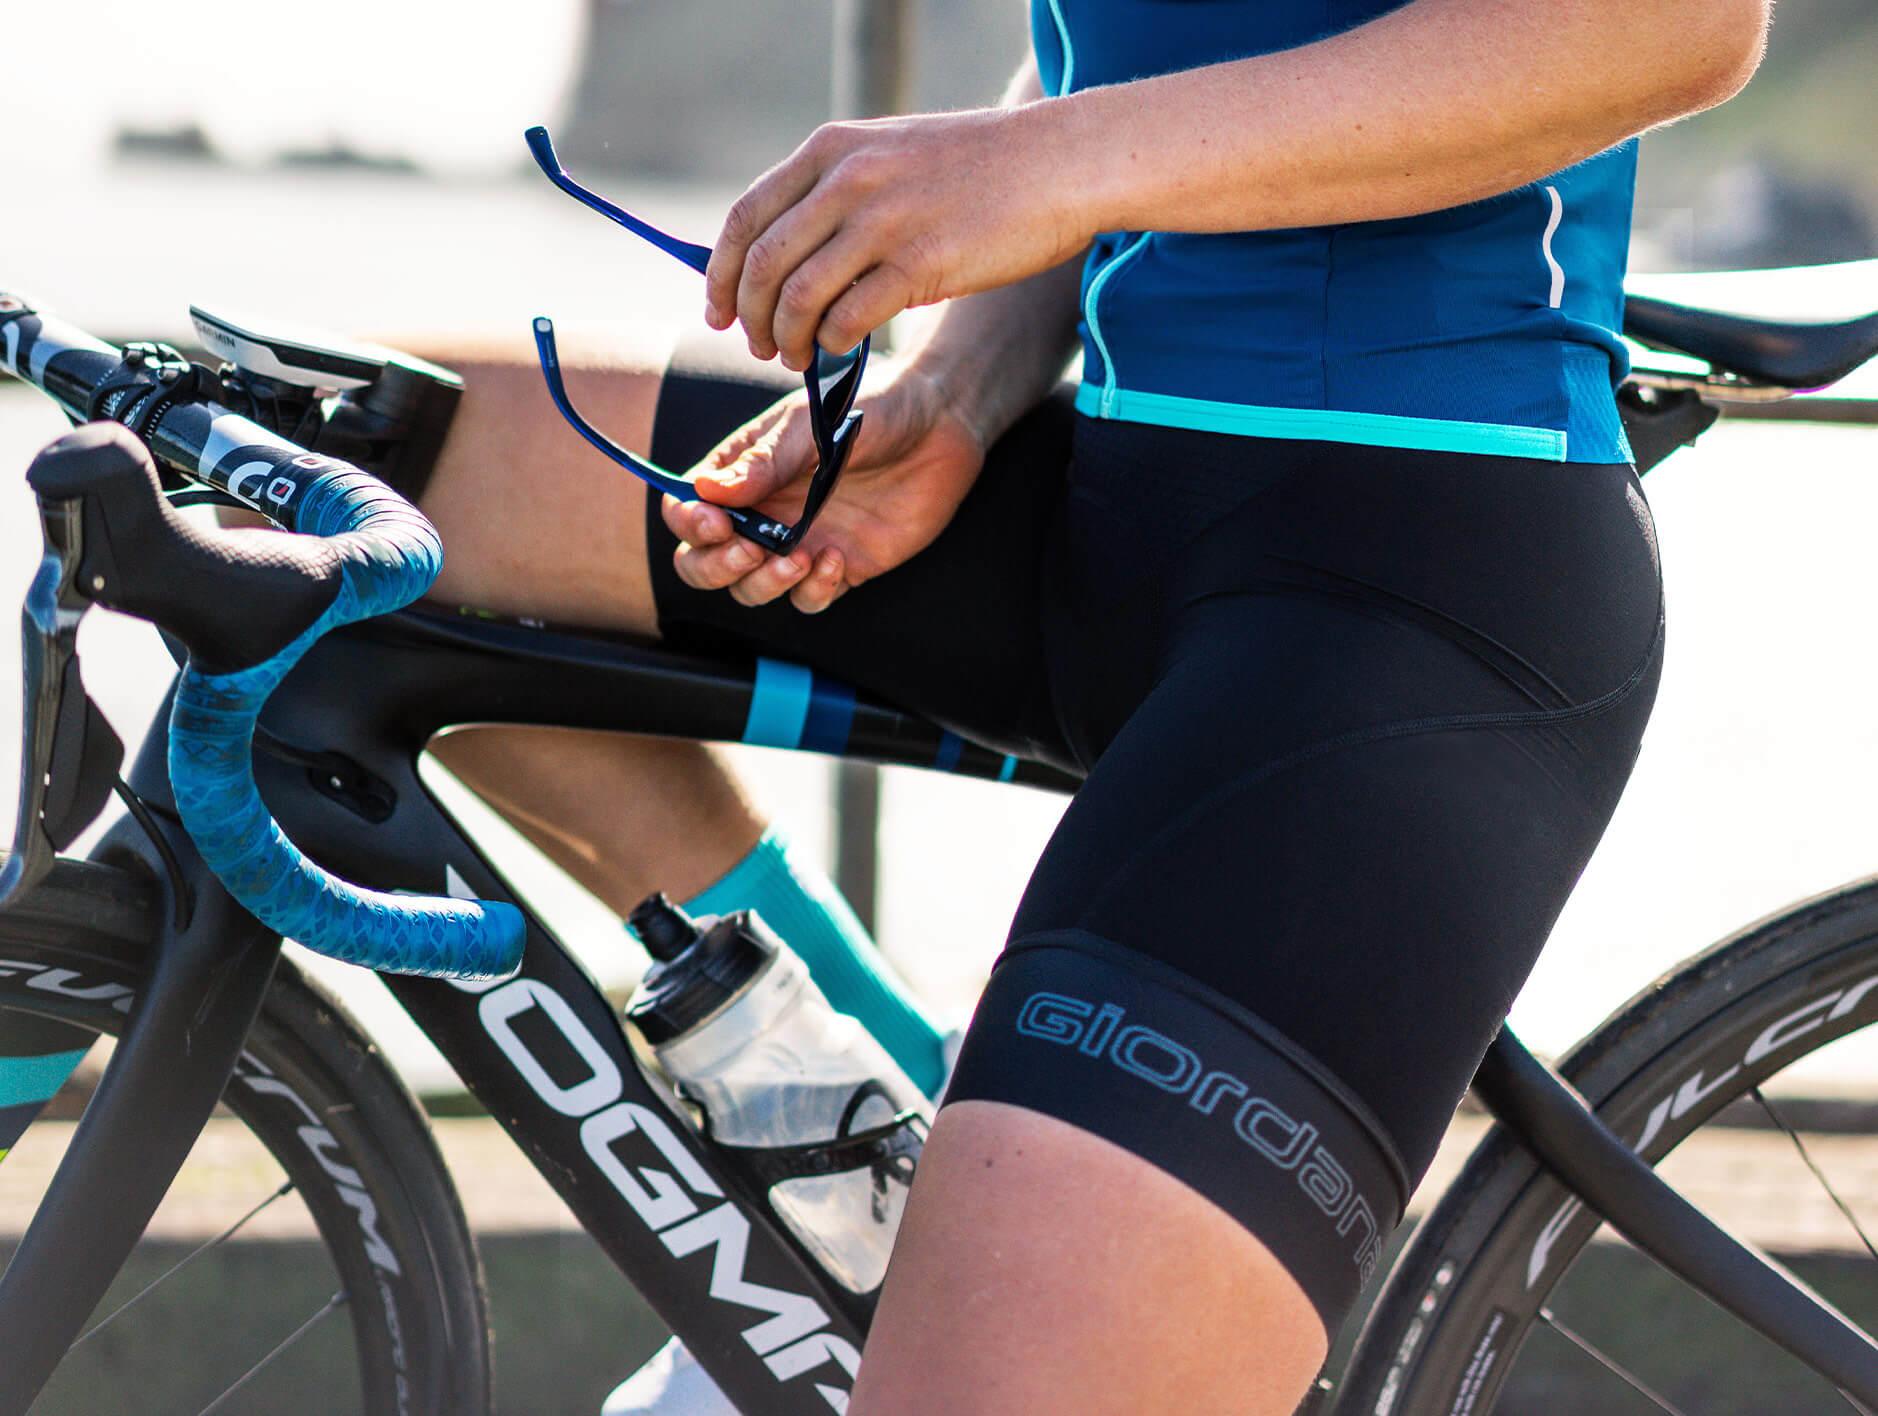 giordana-cycling-womens-bib-short-guide-lungo-square-1